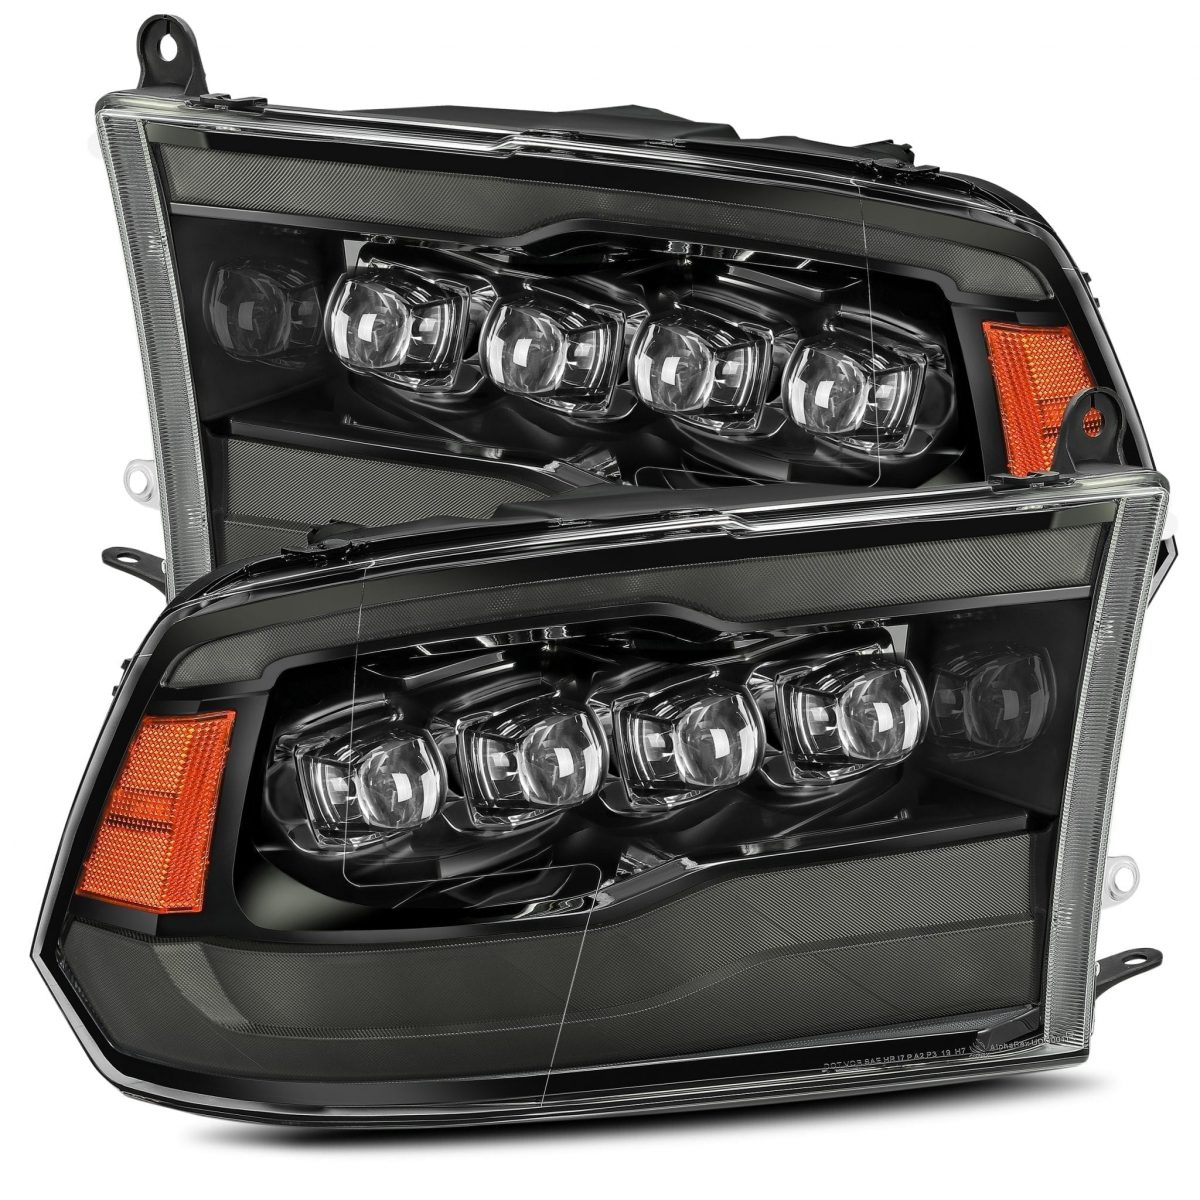 2009 2010 2011 2012 2013 2014 2015 2016 2017 2018 Dodge Ram 1500/2500/3500 NOVA-Series Full LED Projector Headlights Midnight Black